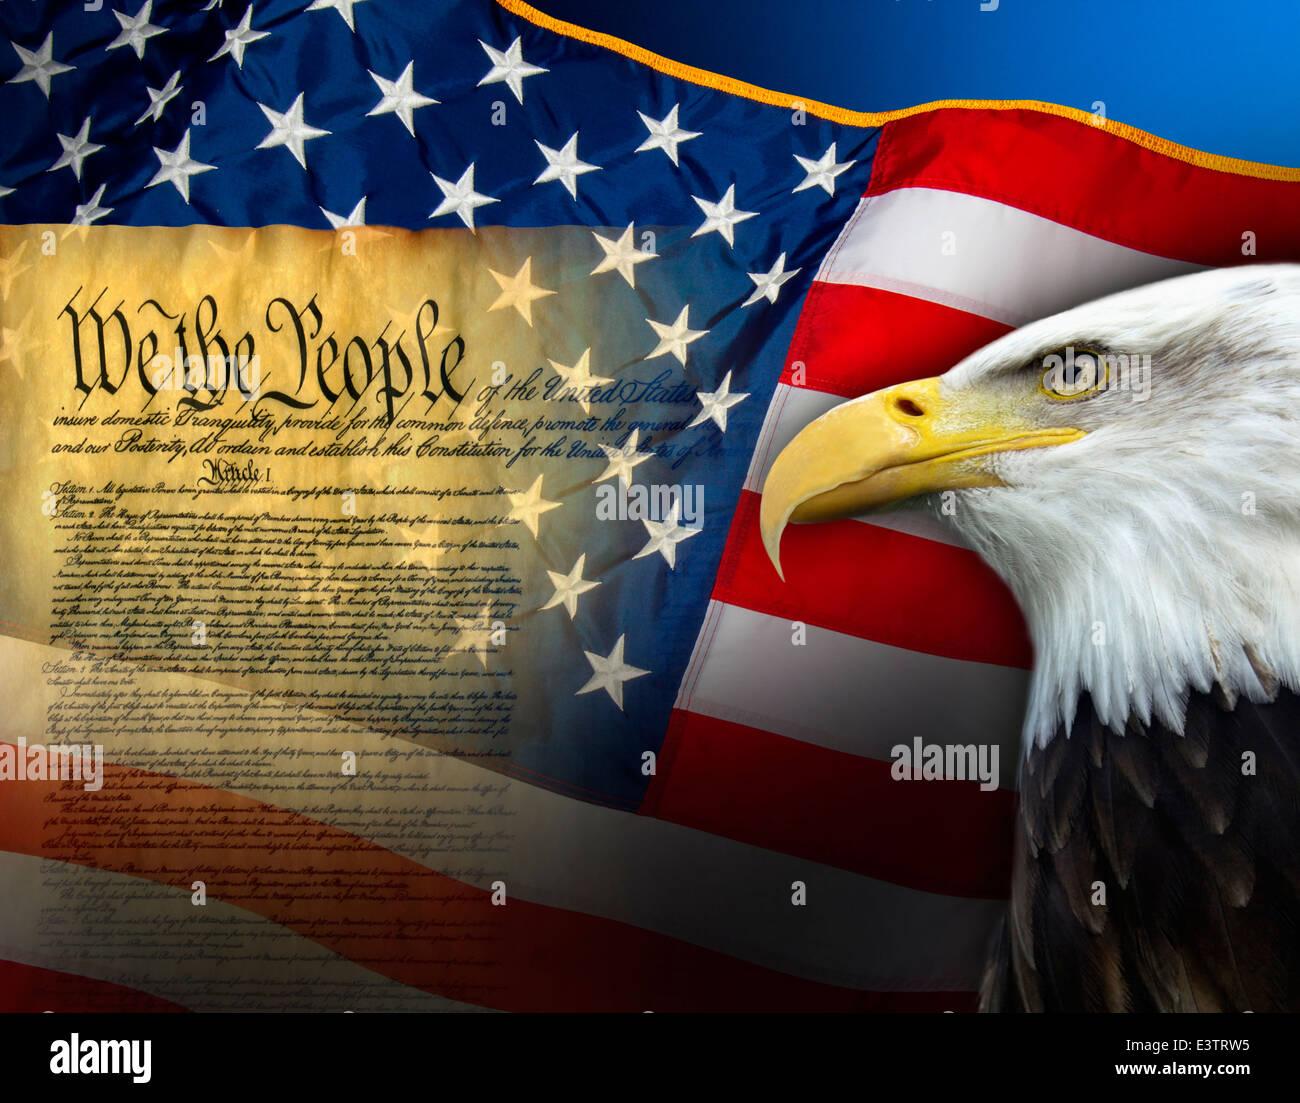 Patriotic Symbols Of The United States Of America Stock